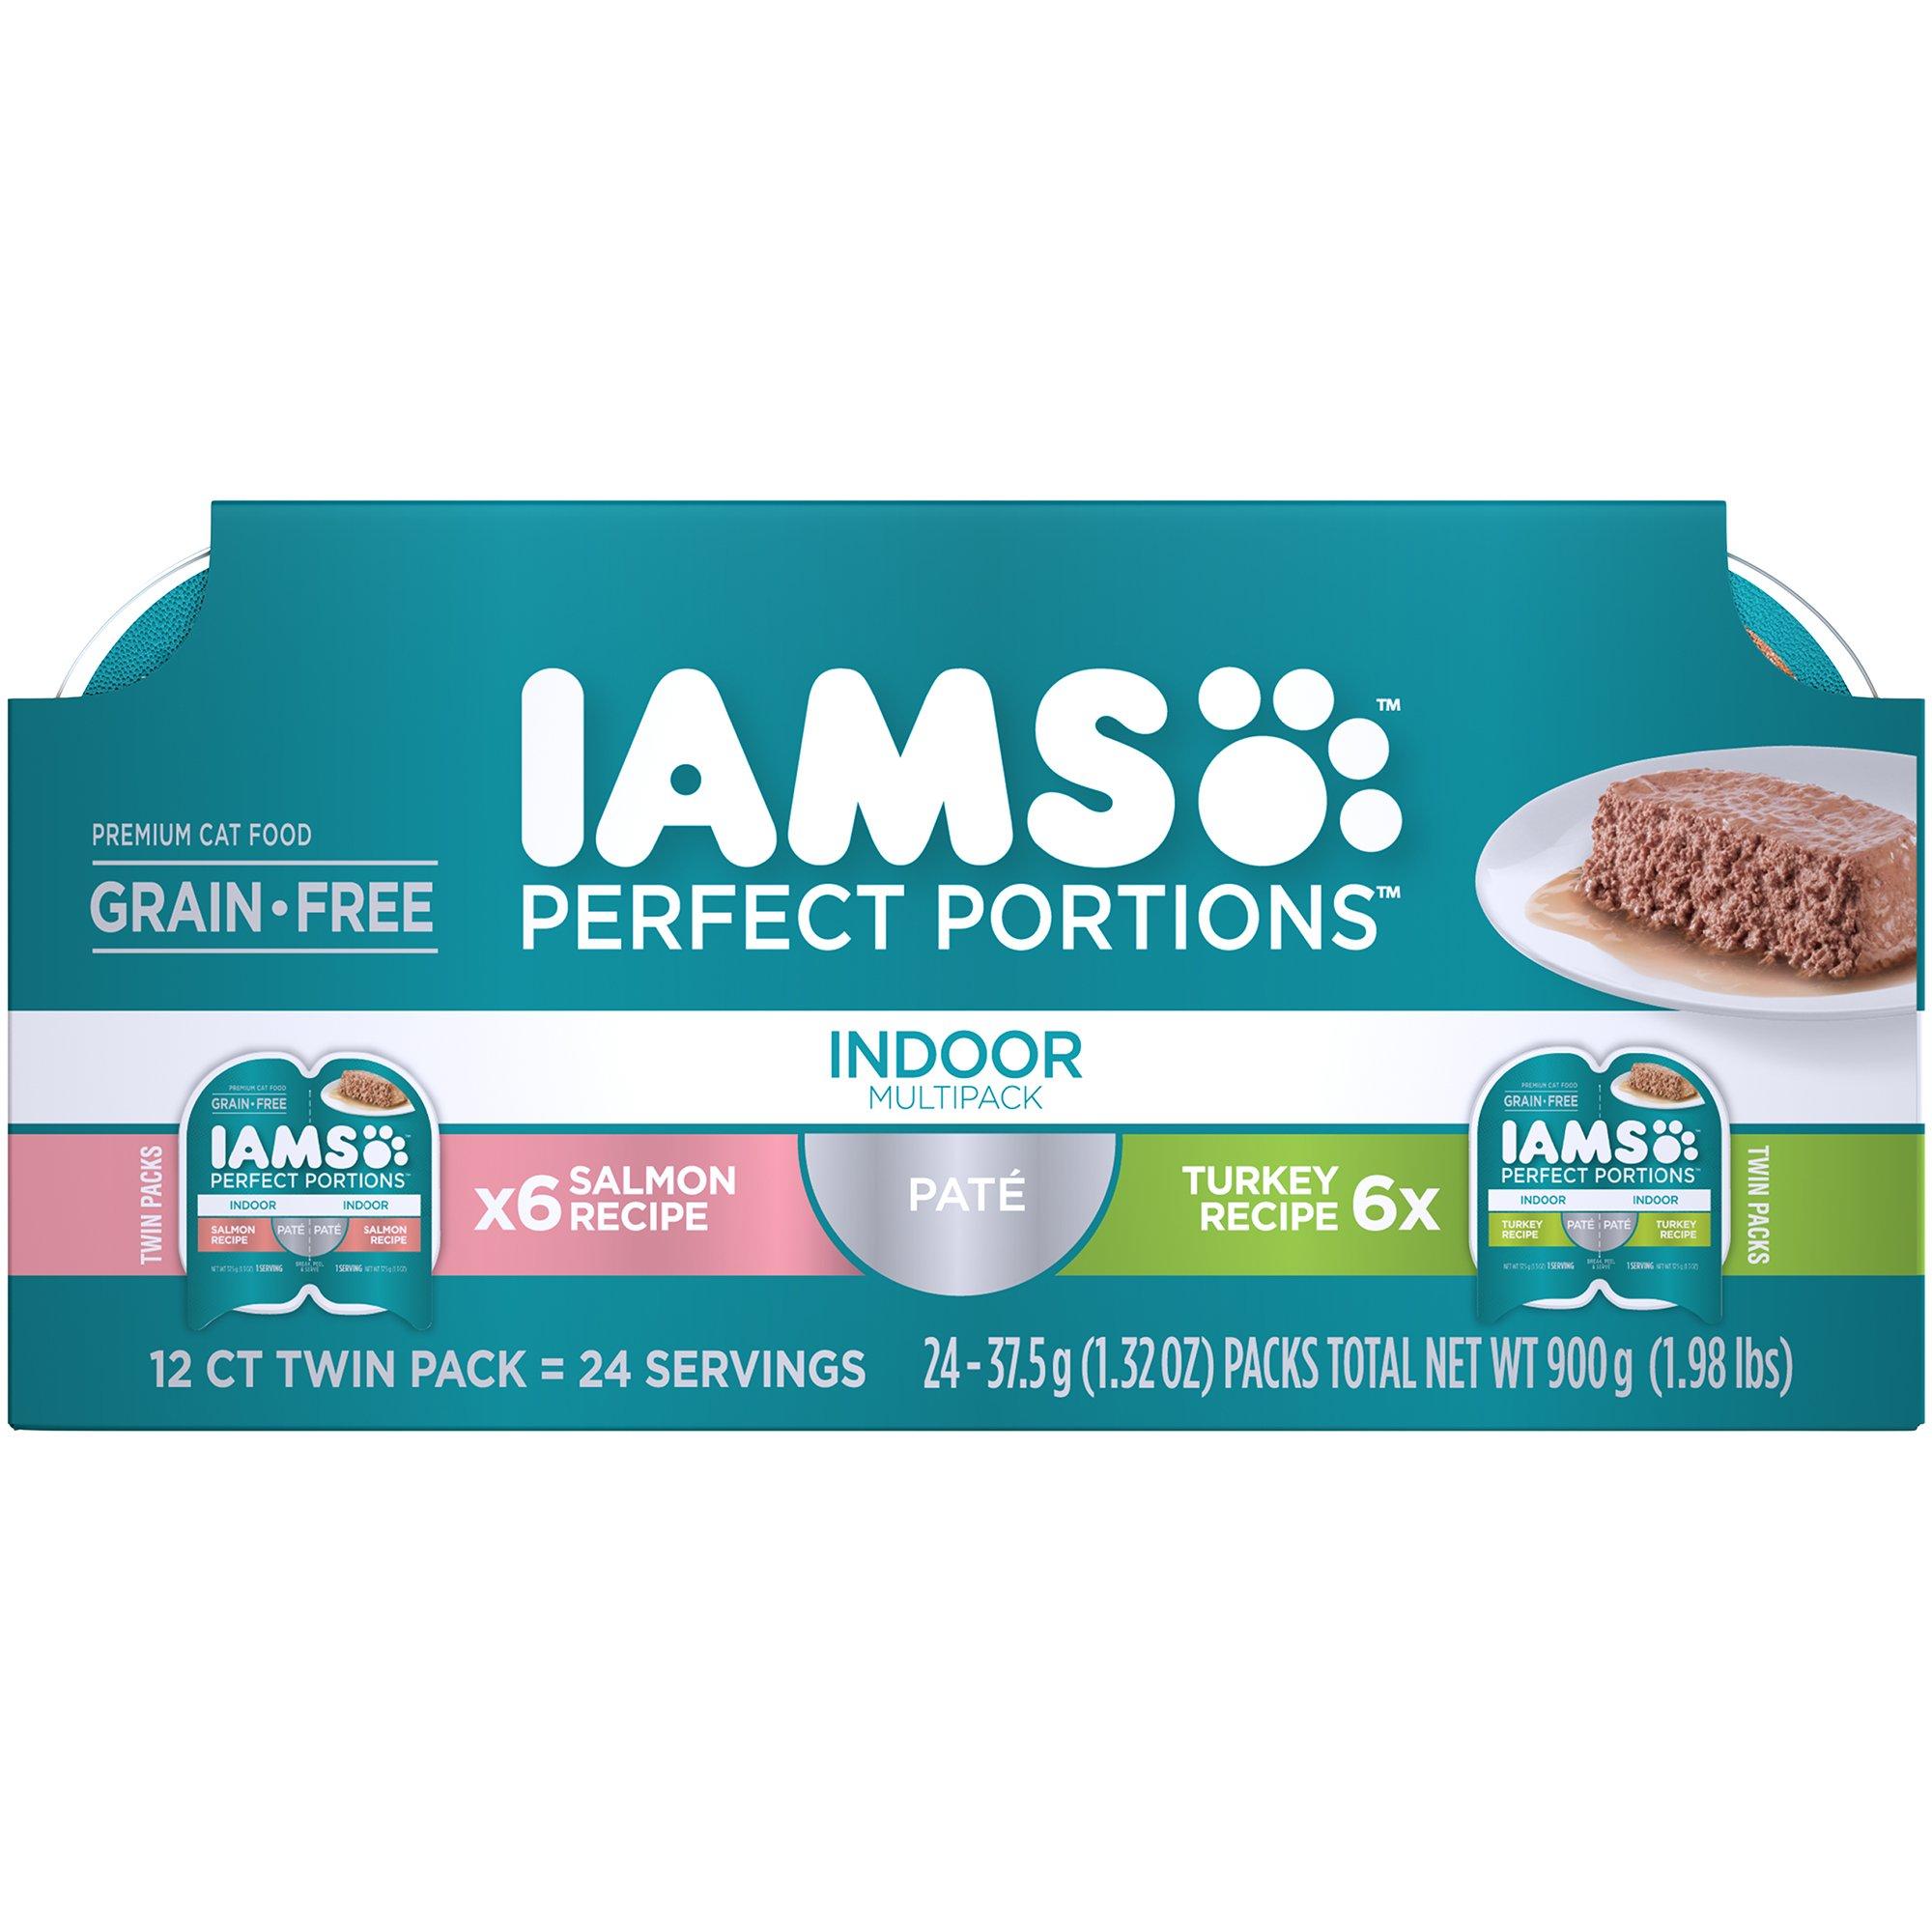 Iams Multipack Indoor Grain Free Wet Cat Food, Salmon and Turkey Pate, 2.6 oz. (24 Twin Packs)